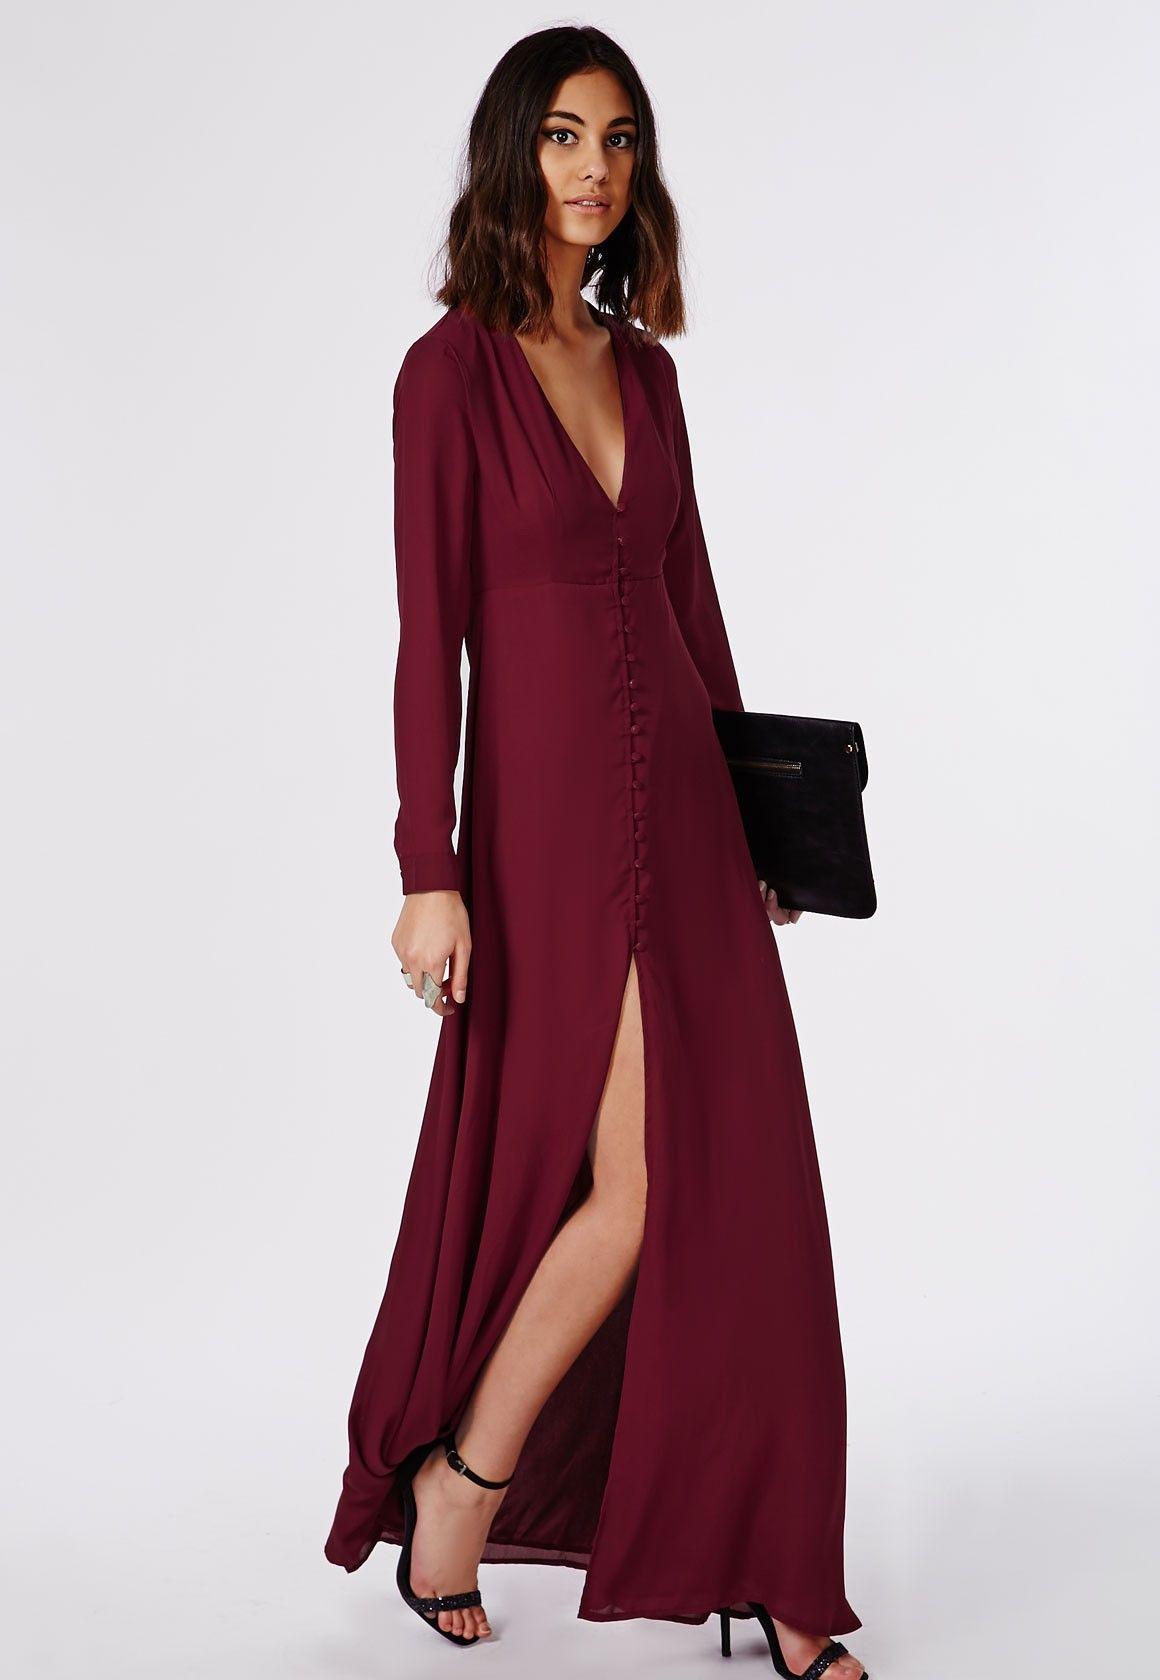 Missguided Effie Long Sleeve Maxi Dress Burgundy Maxi Dress Long Sleeve Maxi Dress Tight Red Dress [ 1680 x 1160 Pixel ]